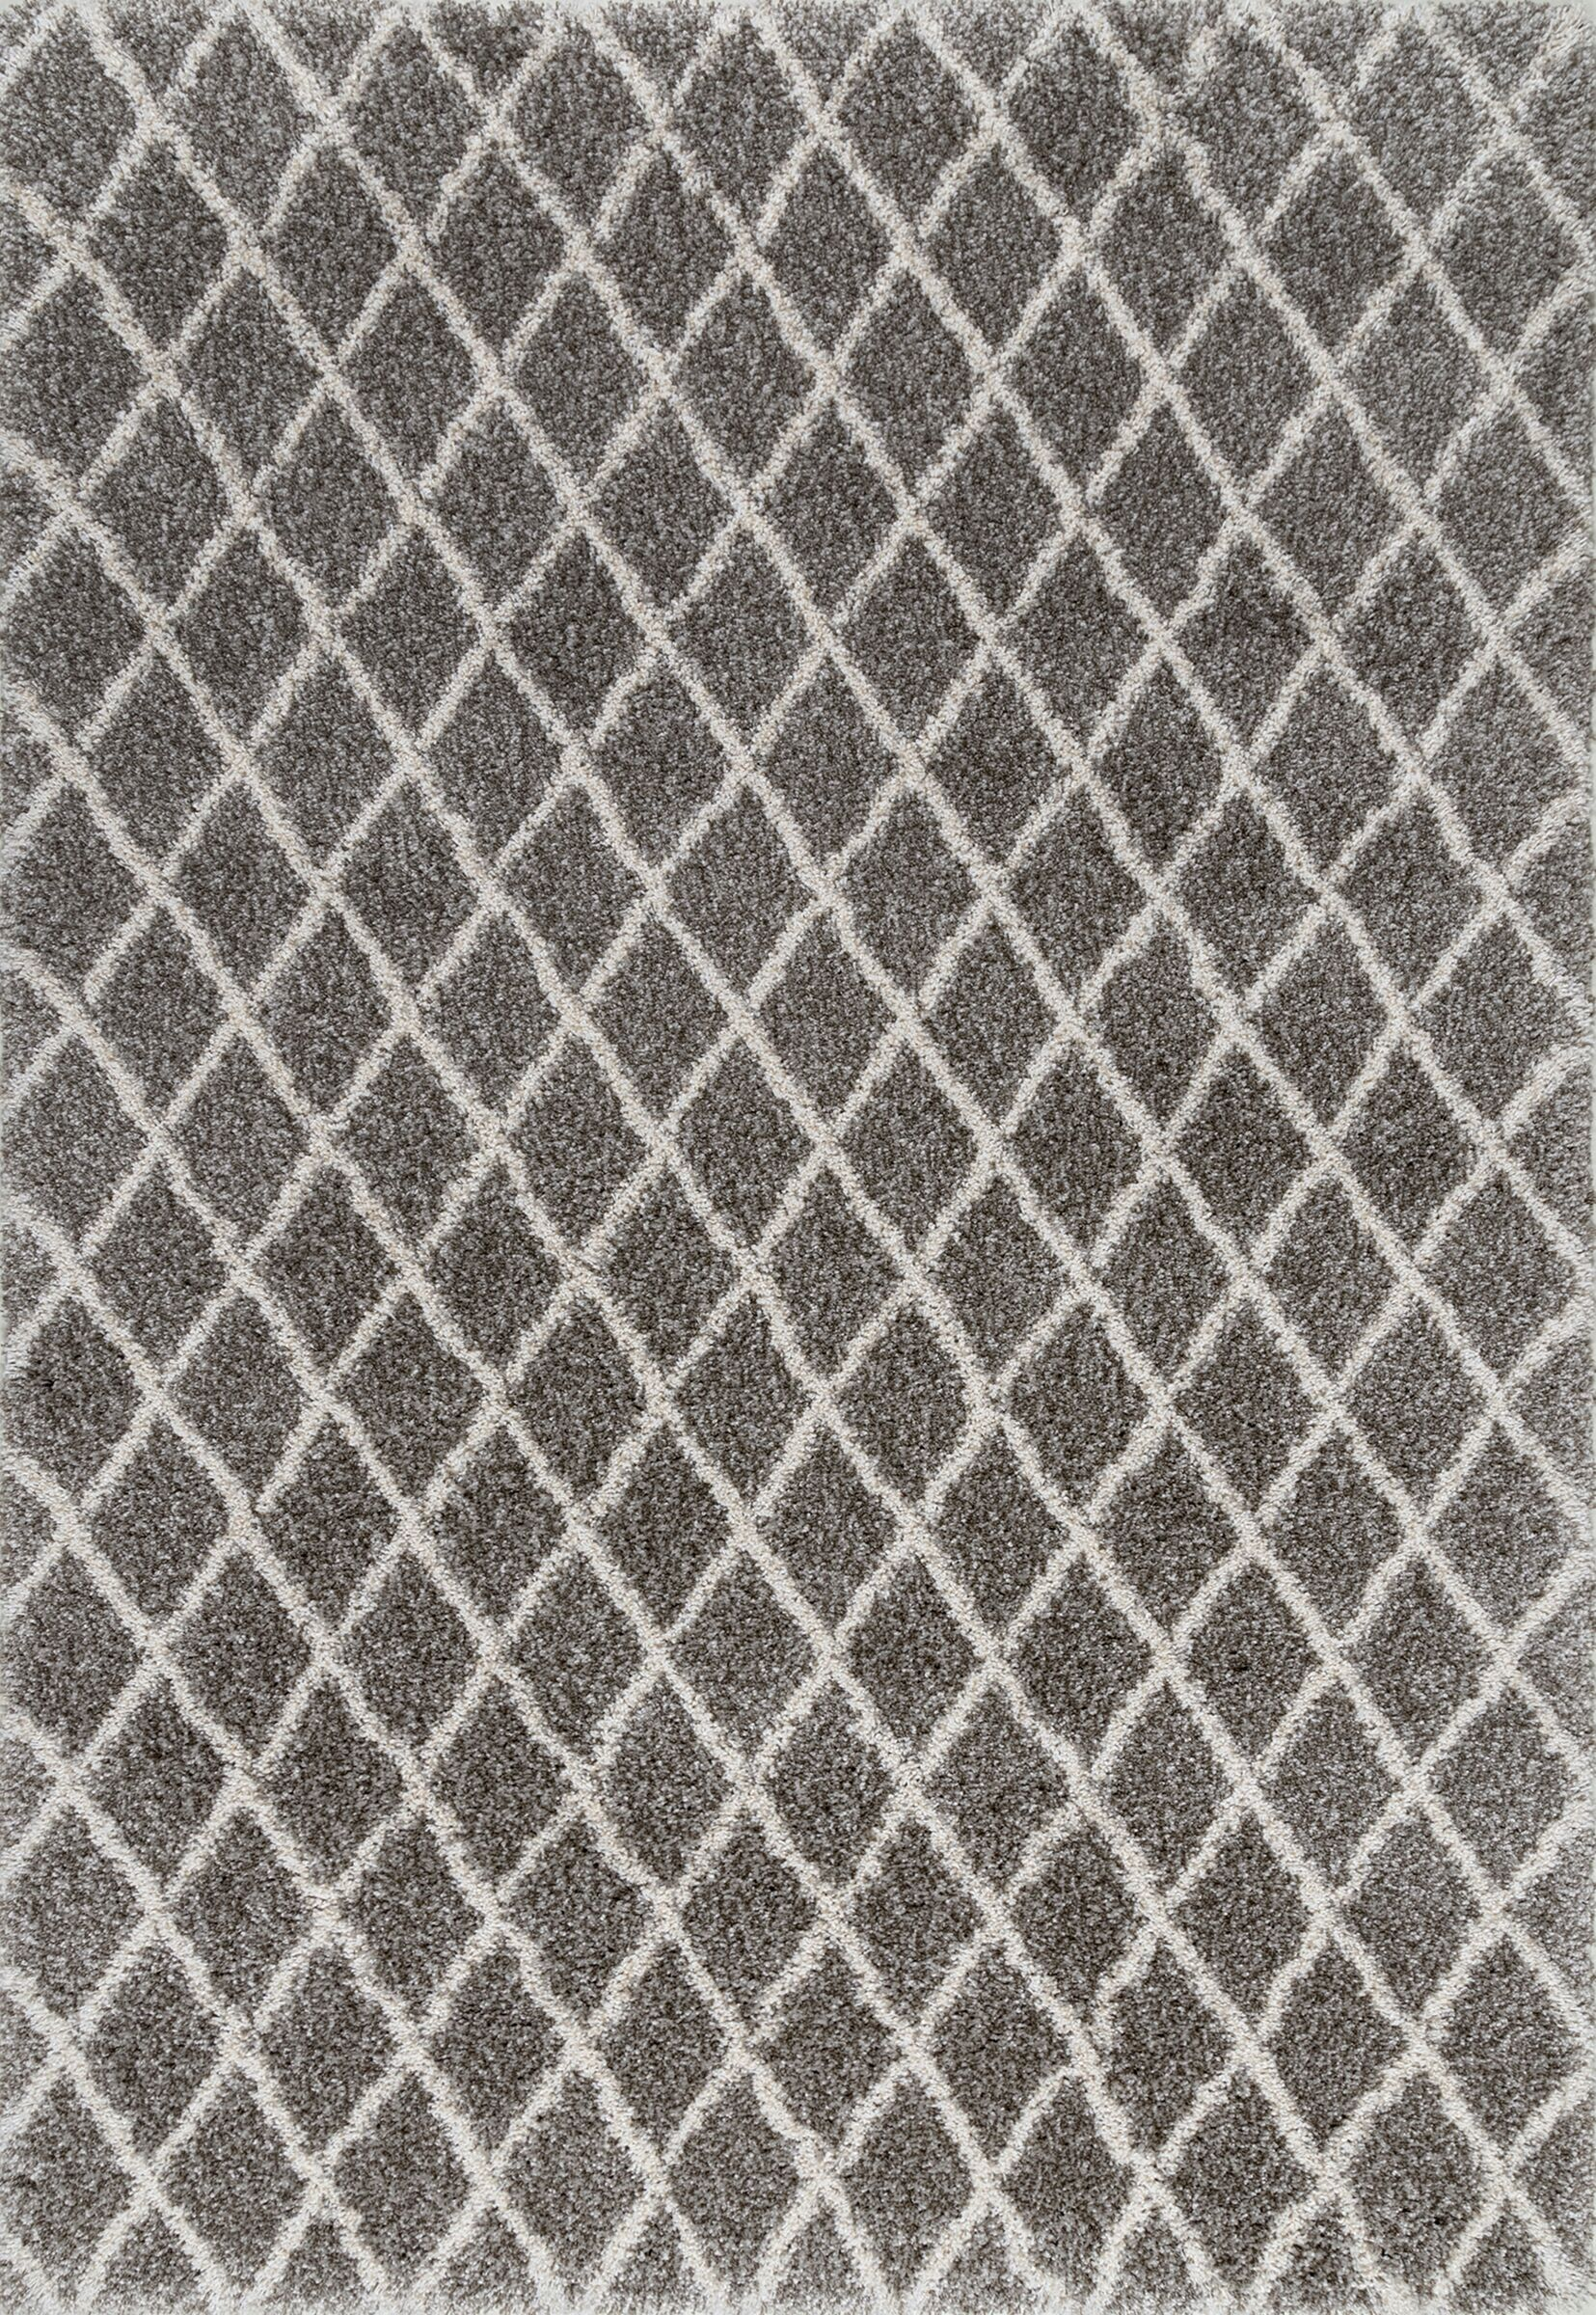 Chaunce Dark Gray Area Rug Rug Size: Rectangle 5' x 8'